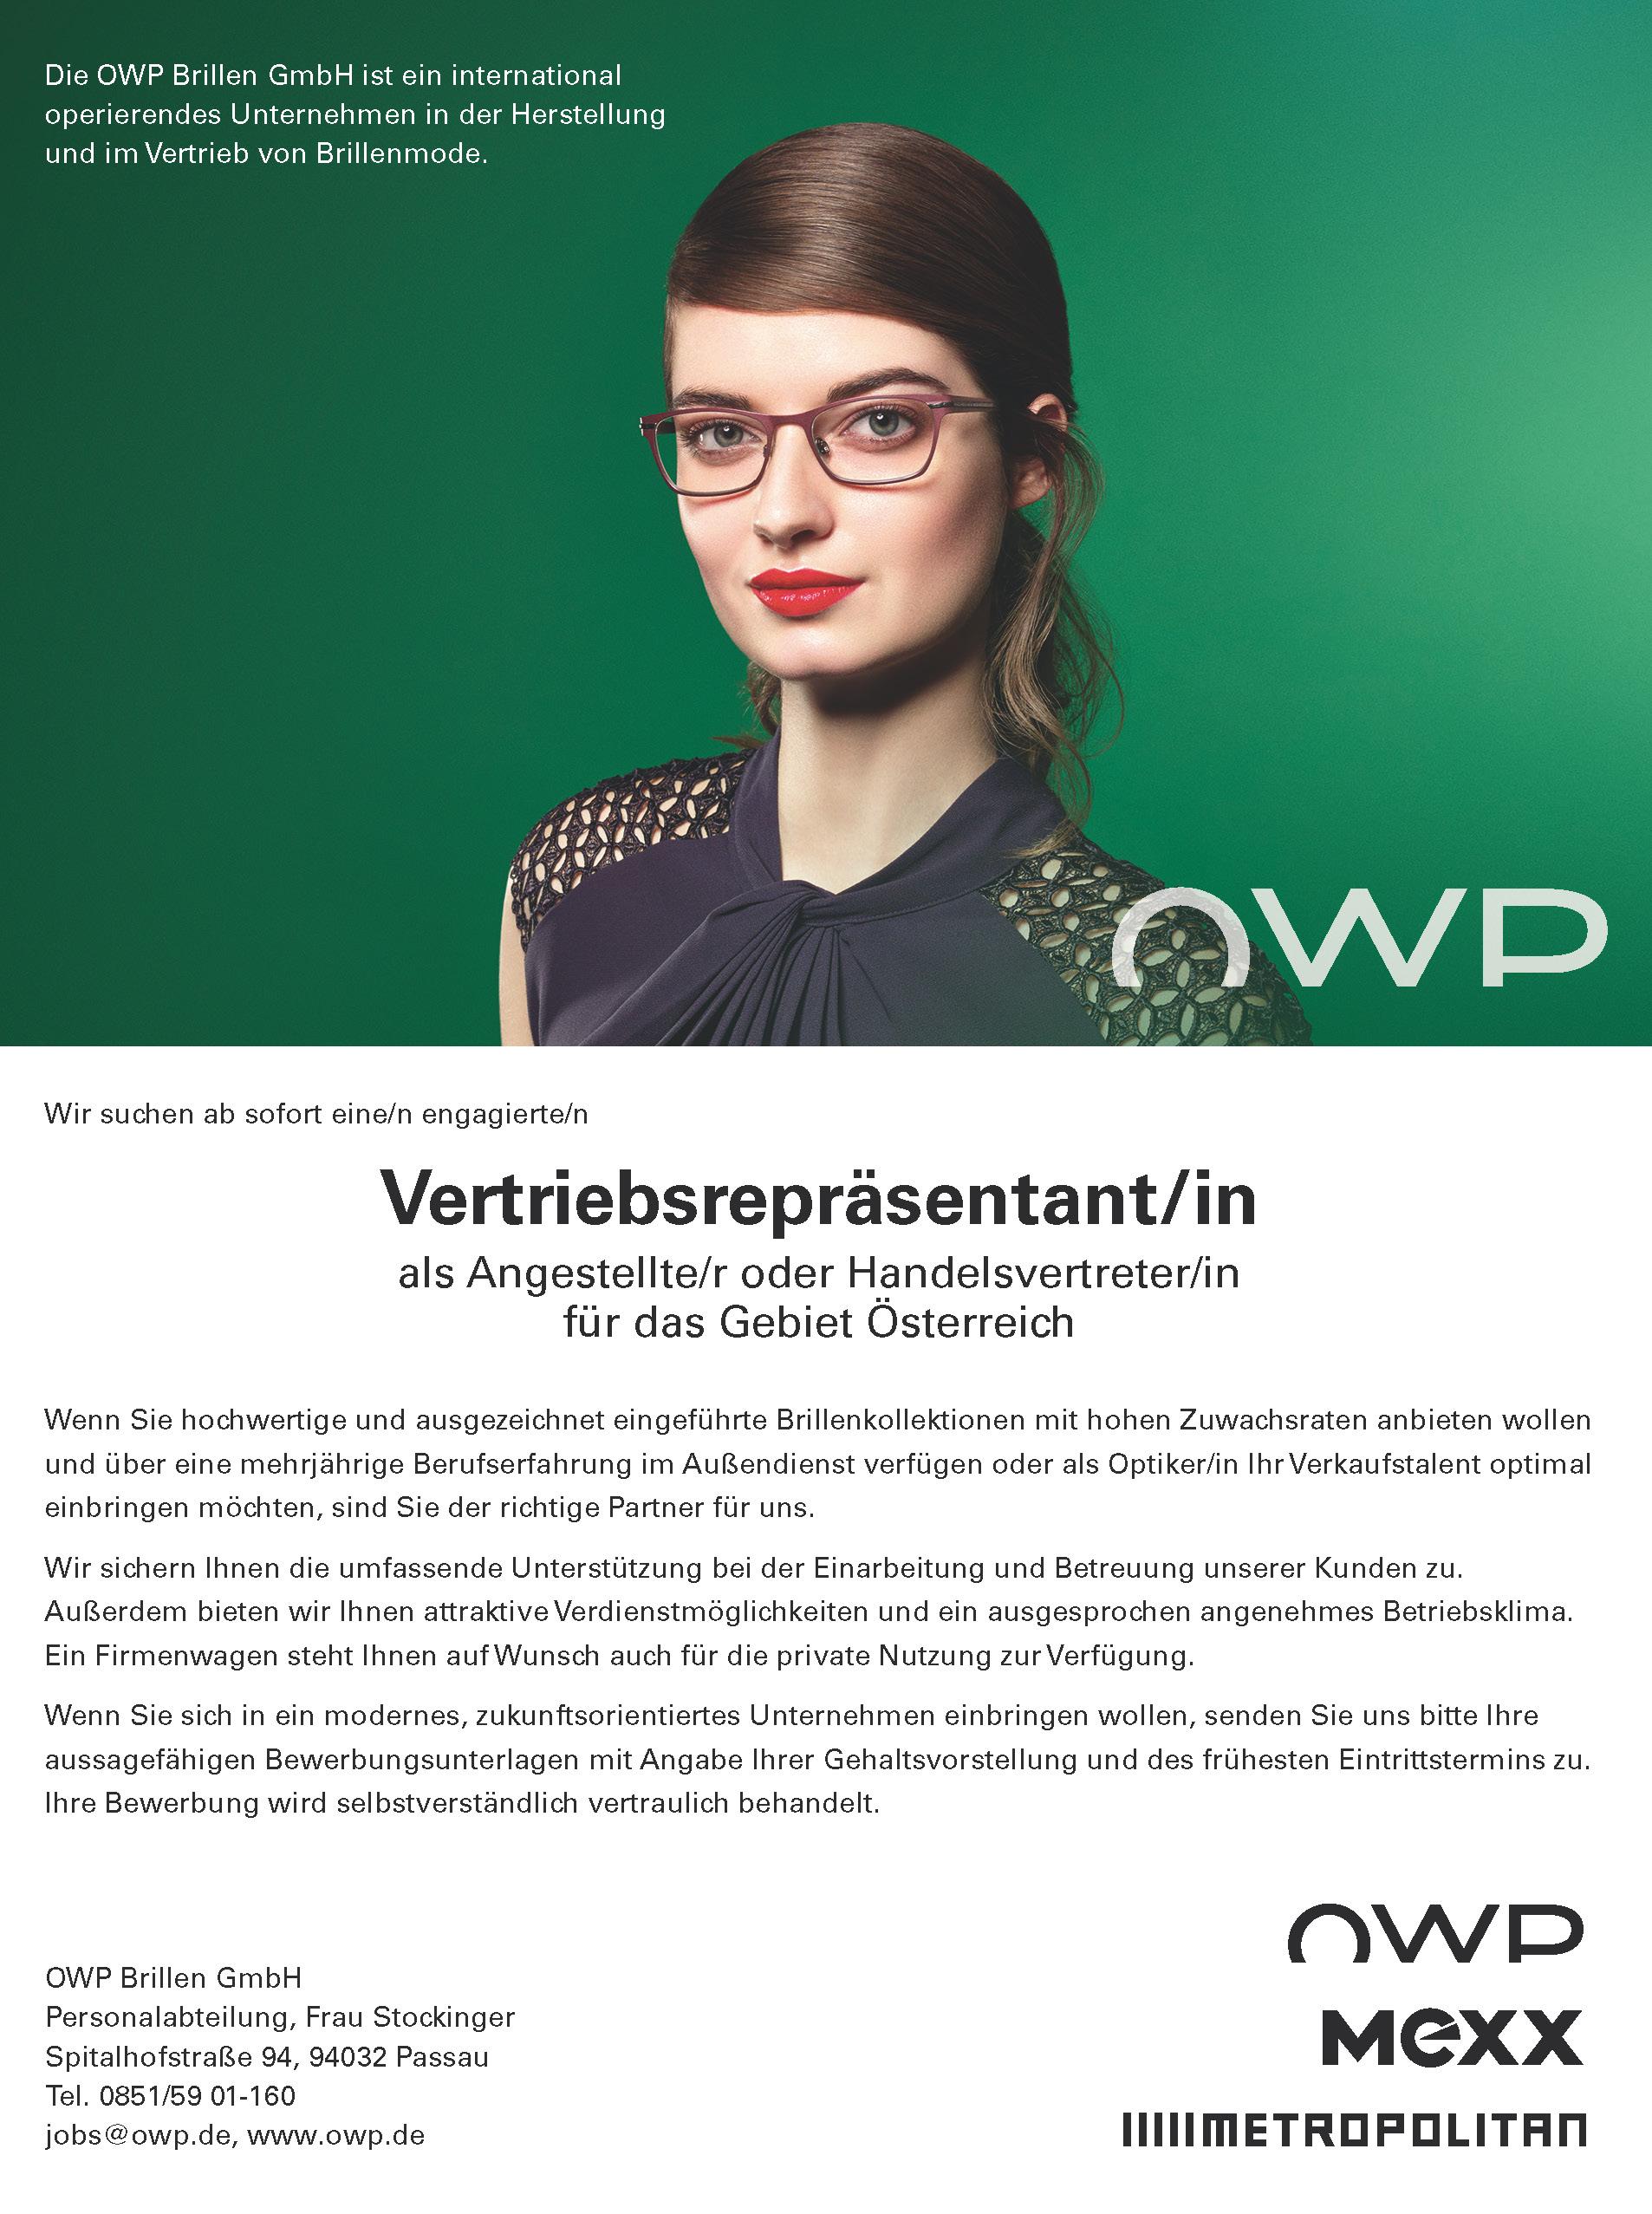 20140224 OWP Repräsentant Austria